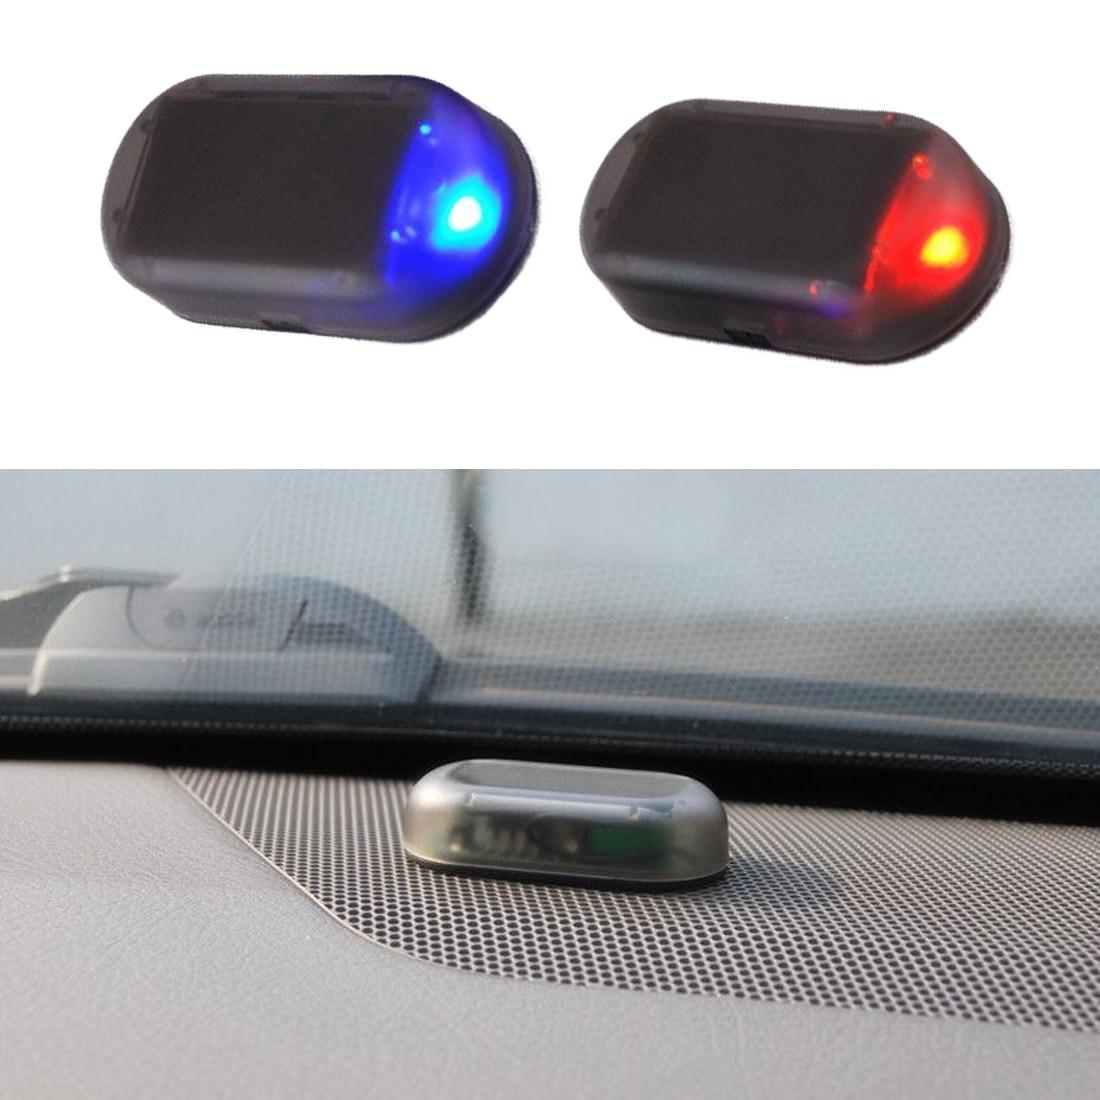 1PCS Universal Car Led Light Security System Warning Theft Flash Blinking Fake Solar Car Alarm LED Light